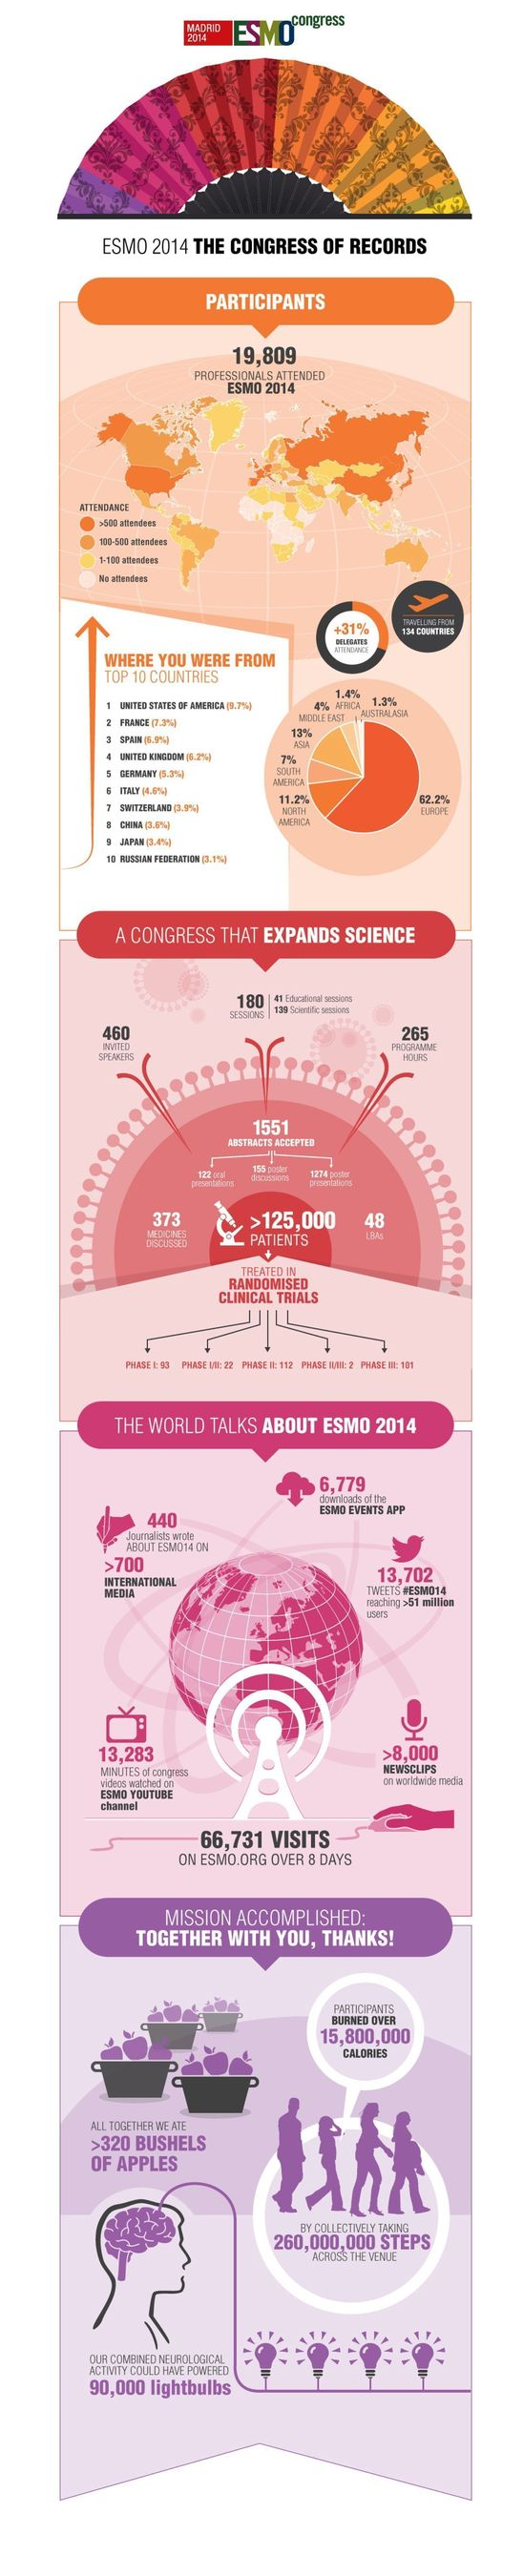 ESMO 2014: a record-breaking congress in 30 seconds. (PRNewsFoto/ESMO)